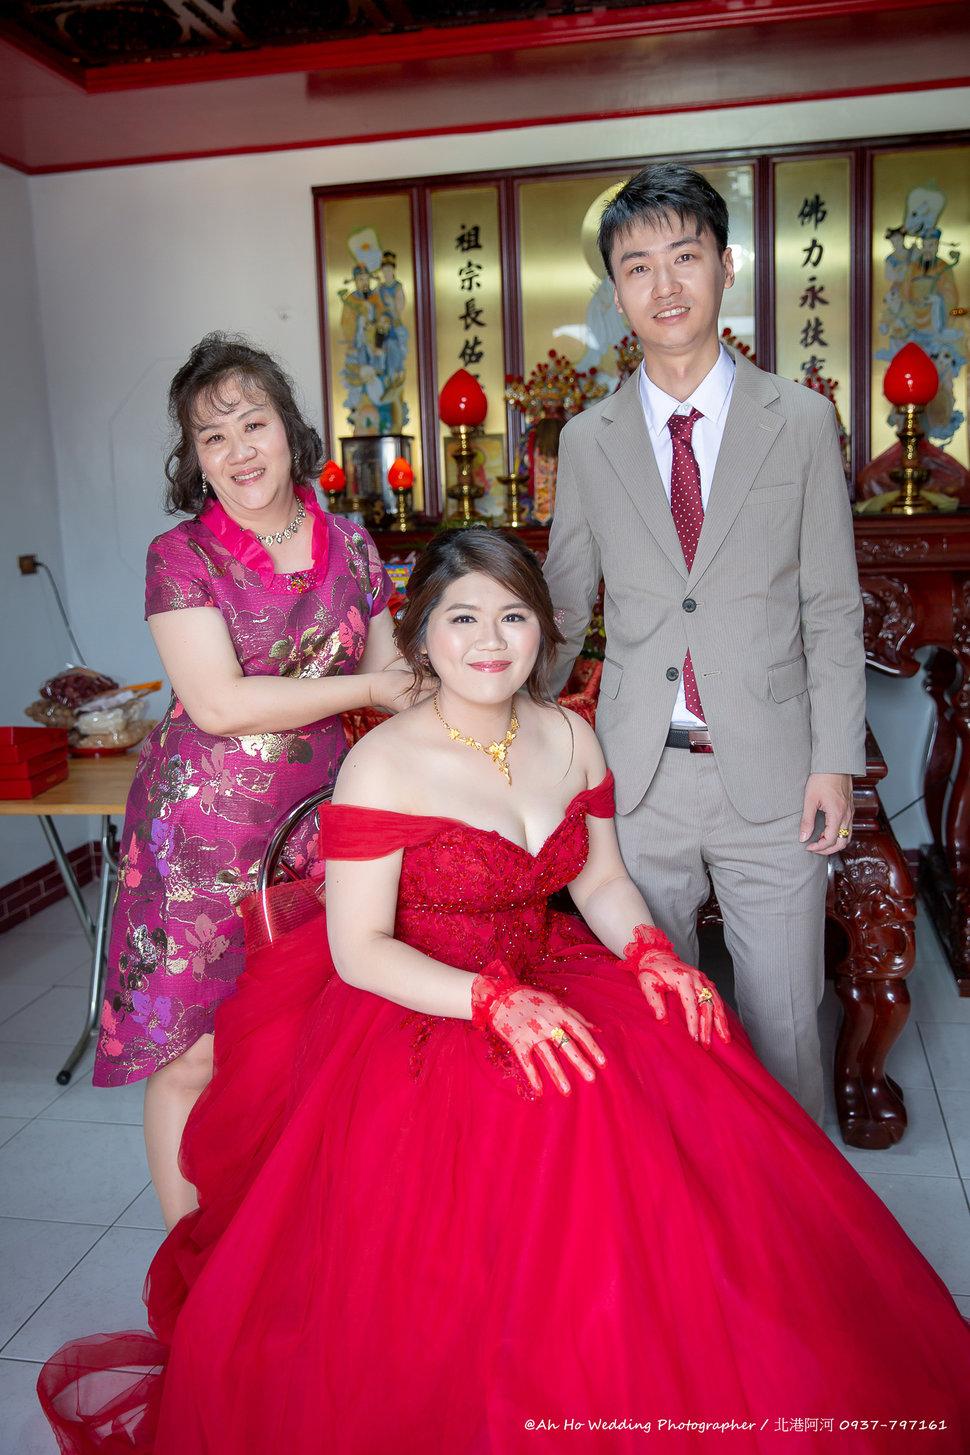 AhHo Wedding TEL-0937797161 lineID-chiupeiho-92 - 北港阿河婚攝 AhHoWedding - 結婚吧